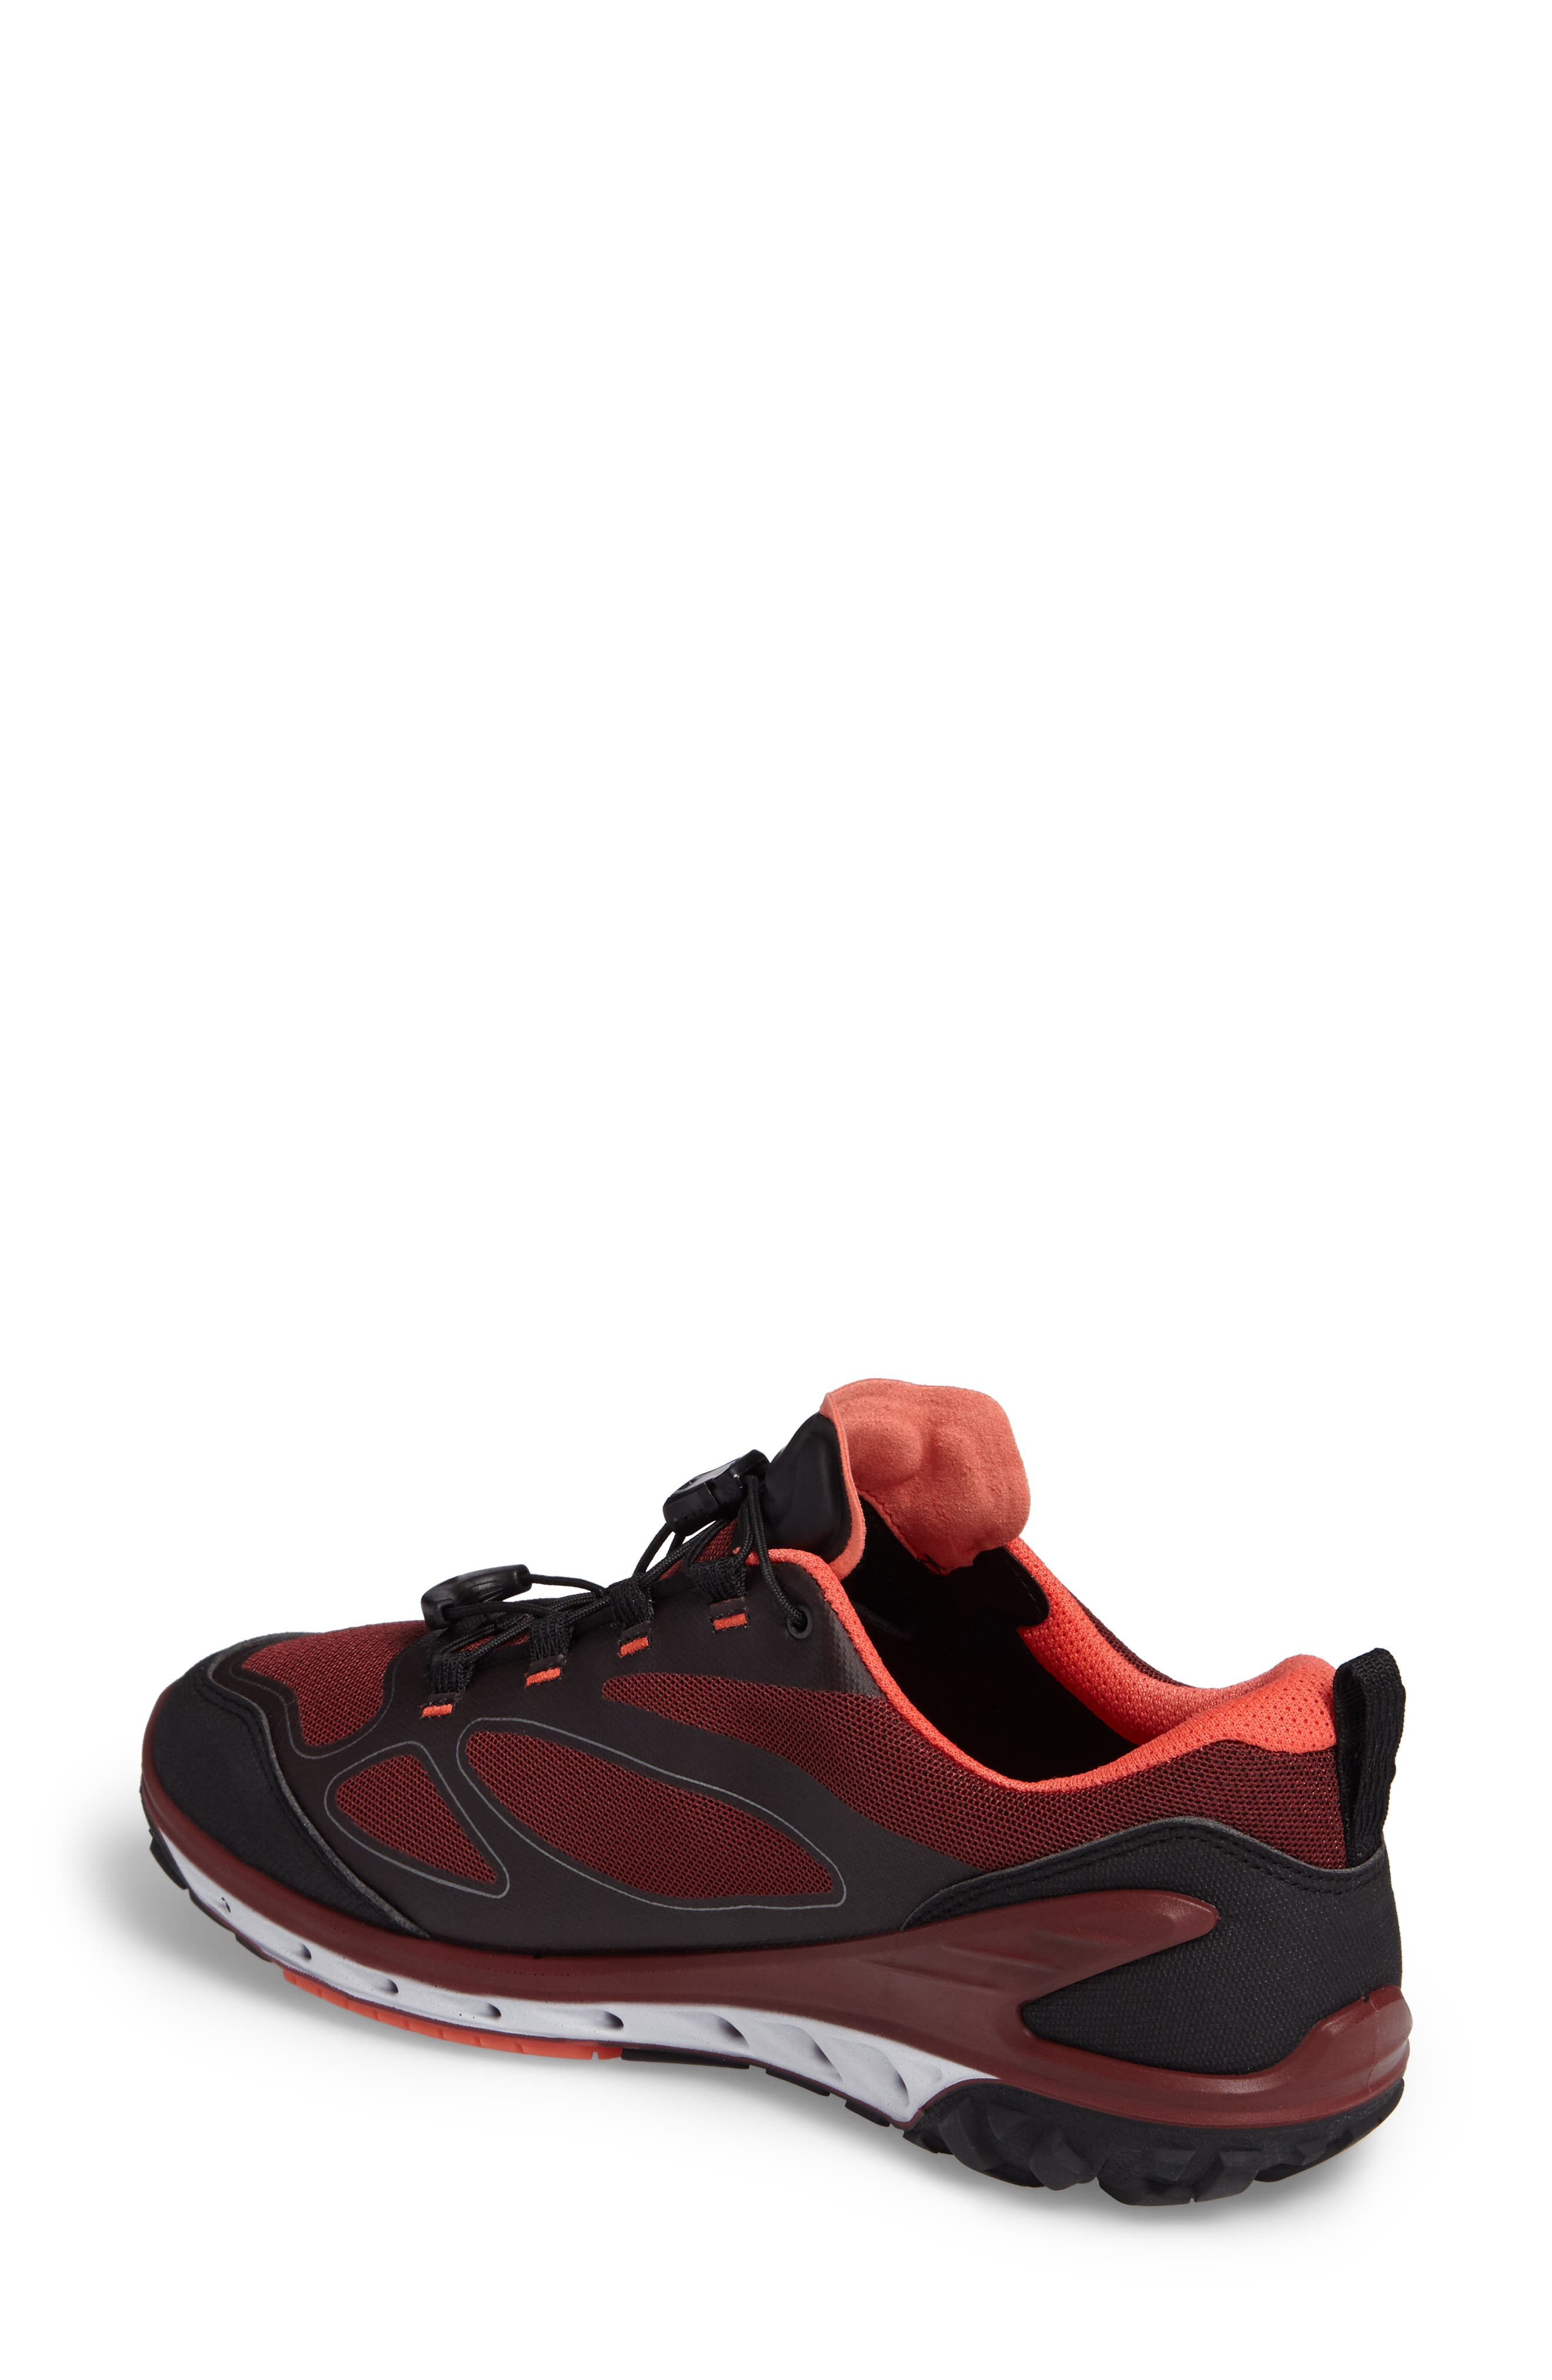 BIOM Venture GTX Sneaker,                             Alternate thumbnail 6, color,